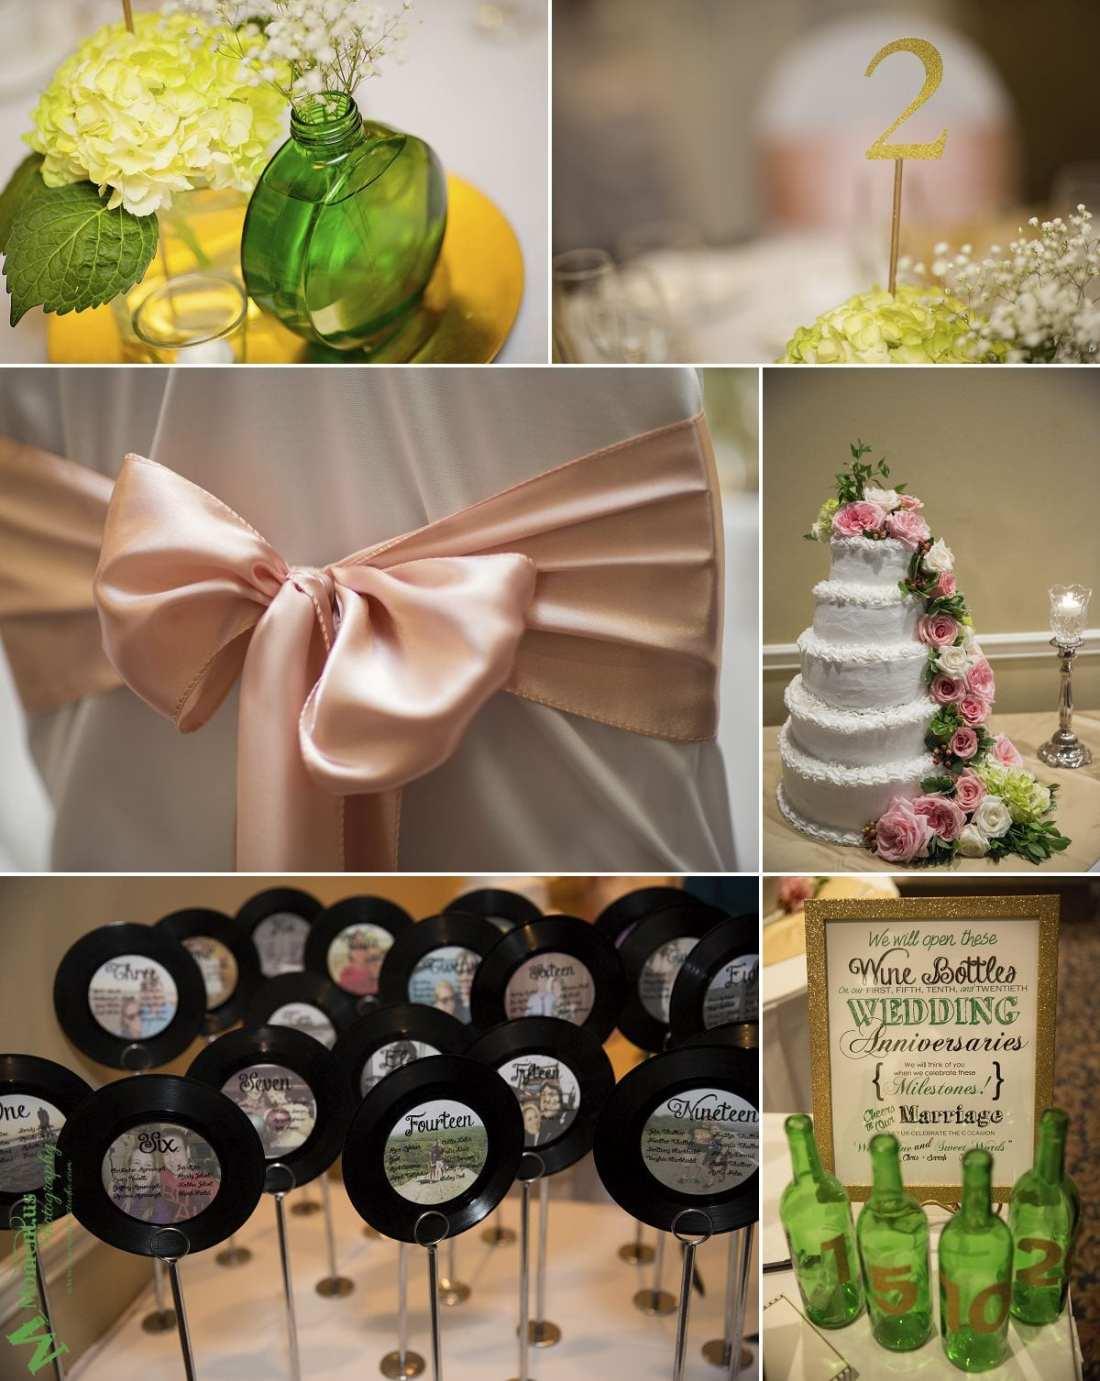 Elegant Cornwall wedding - green glass centrepiece